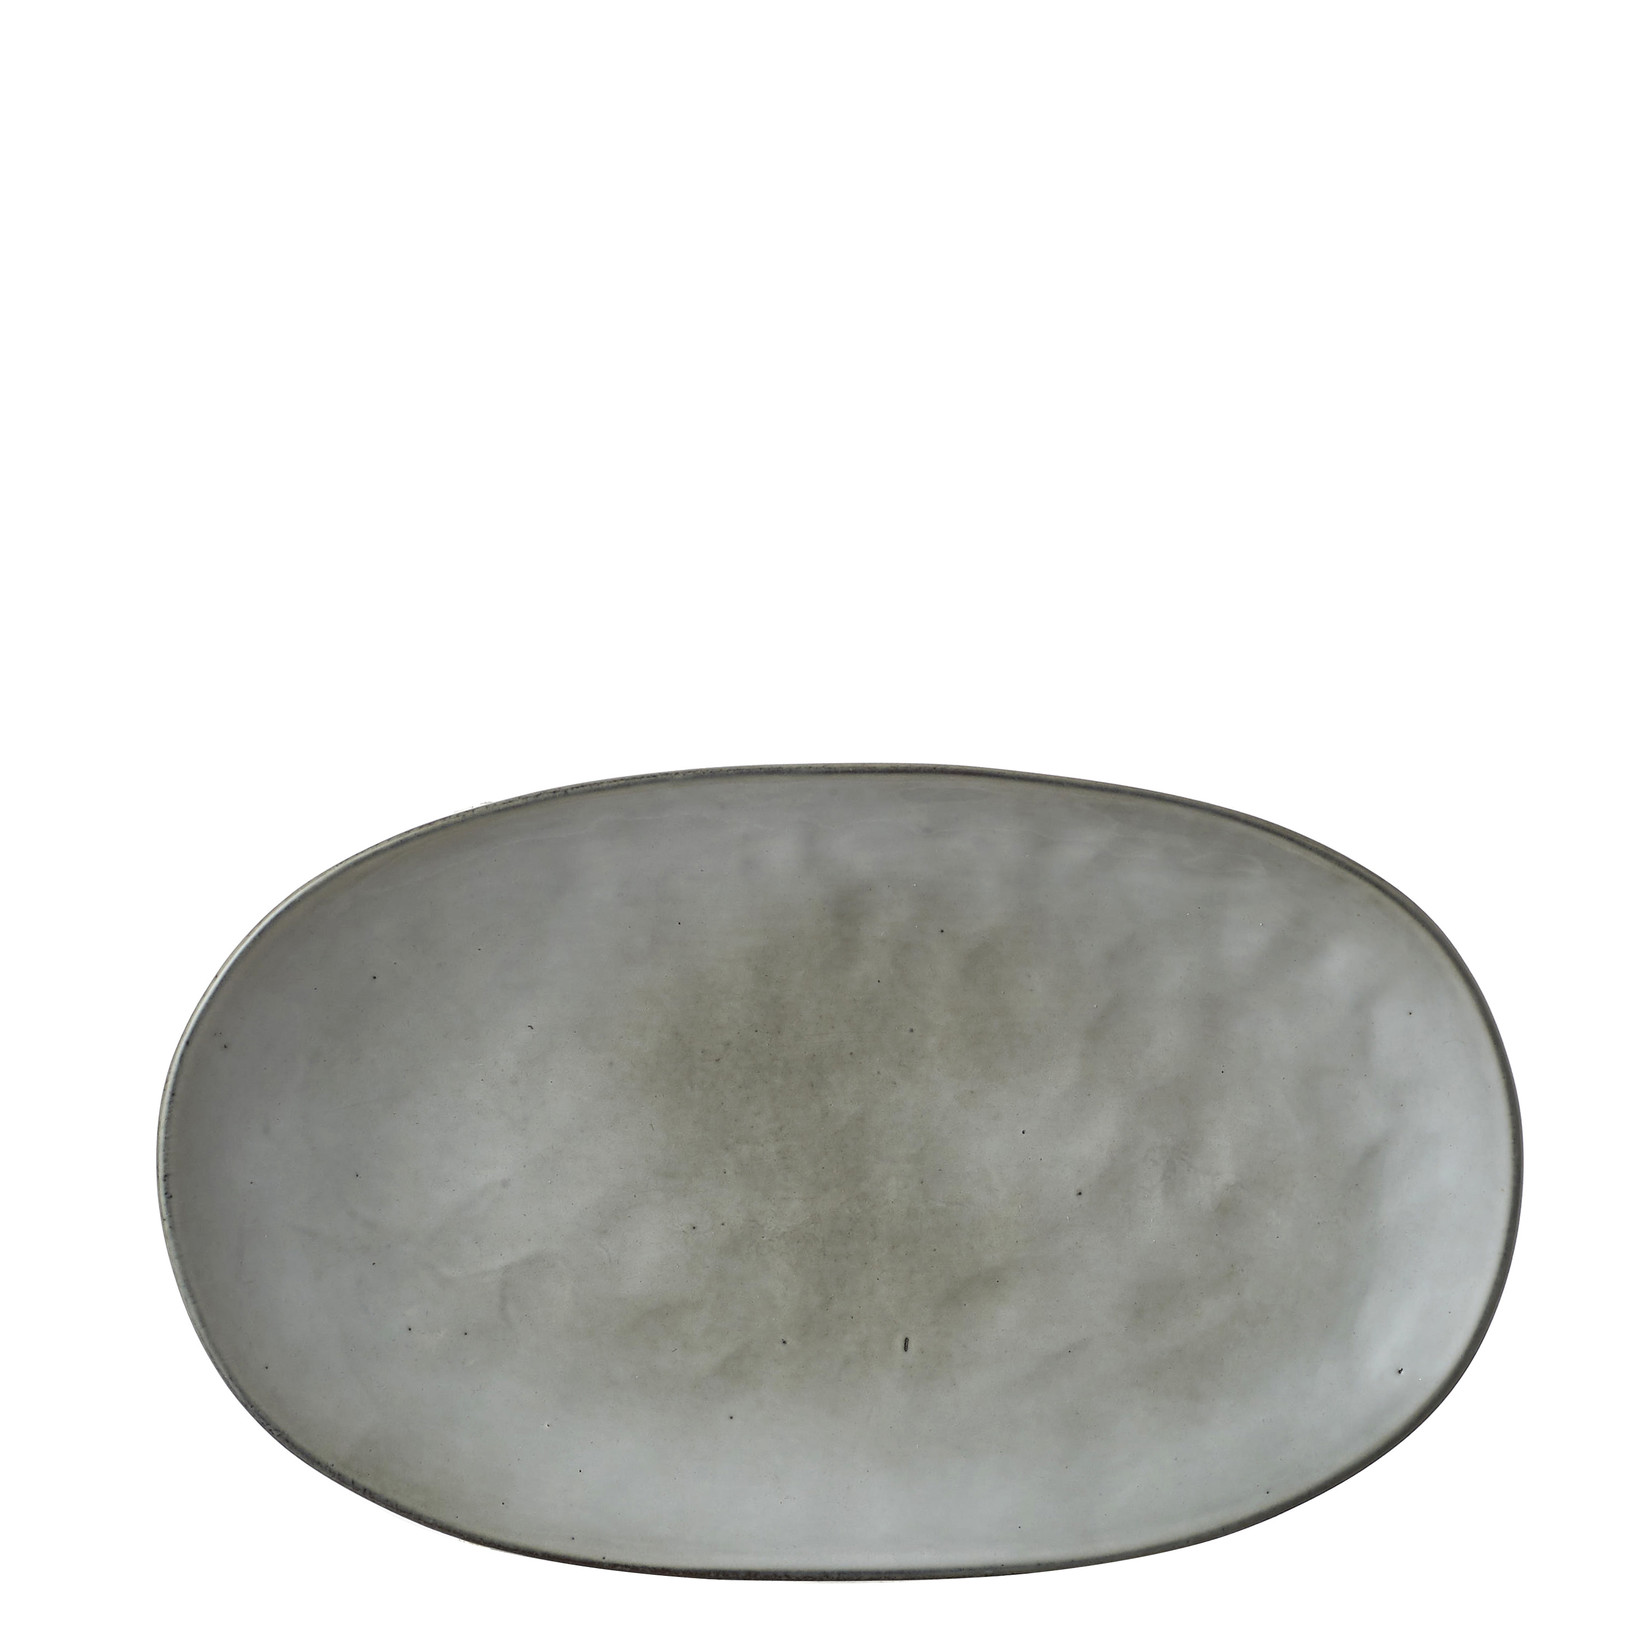 MiCa 1047469 Tabo plate gray